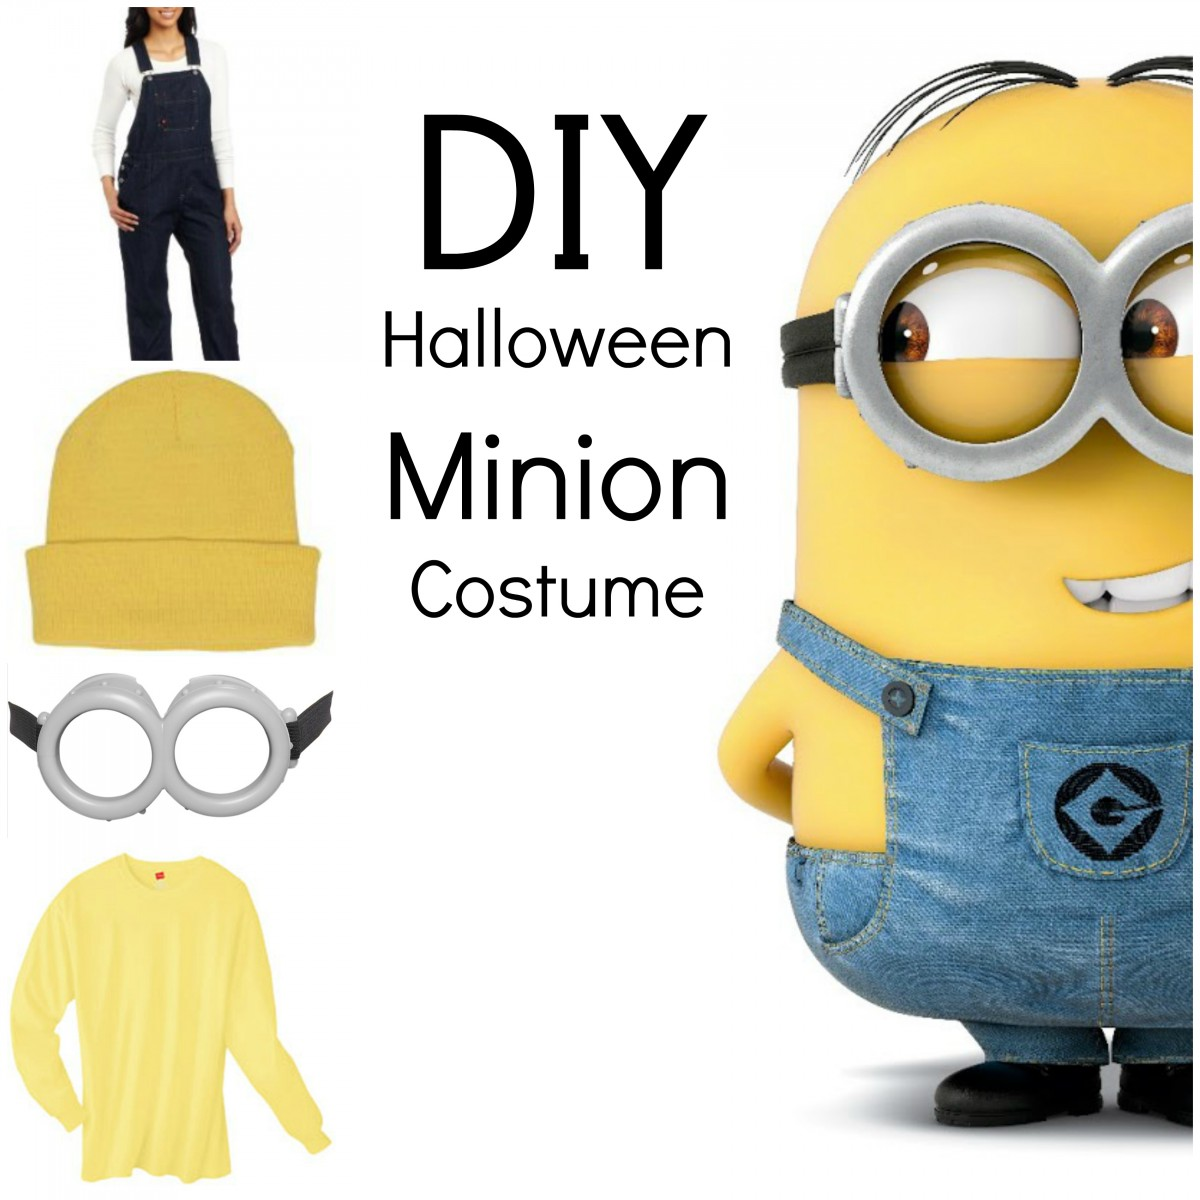 DIY Halloween Minion Costume - Her Heartland Soul